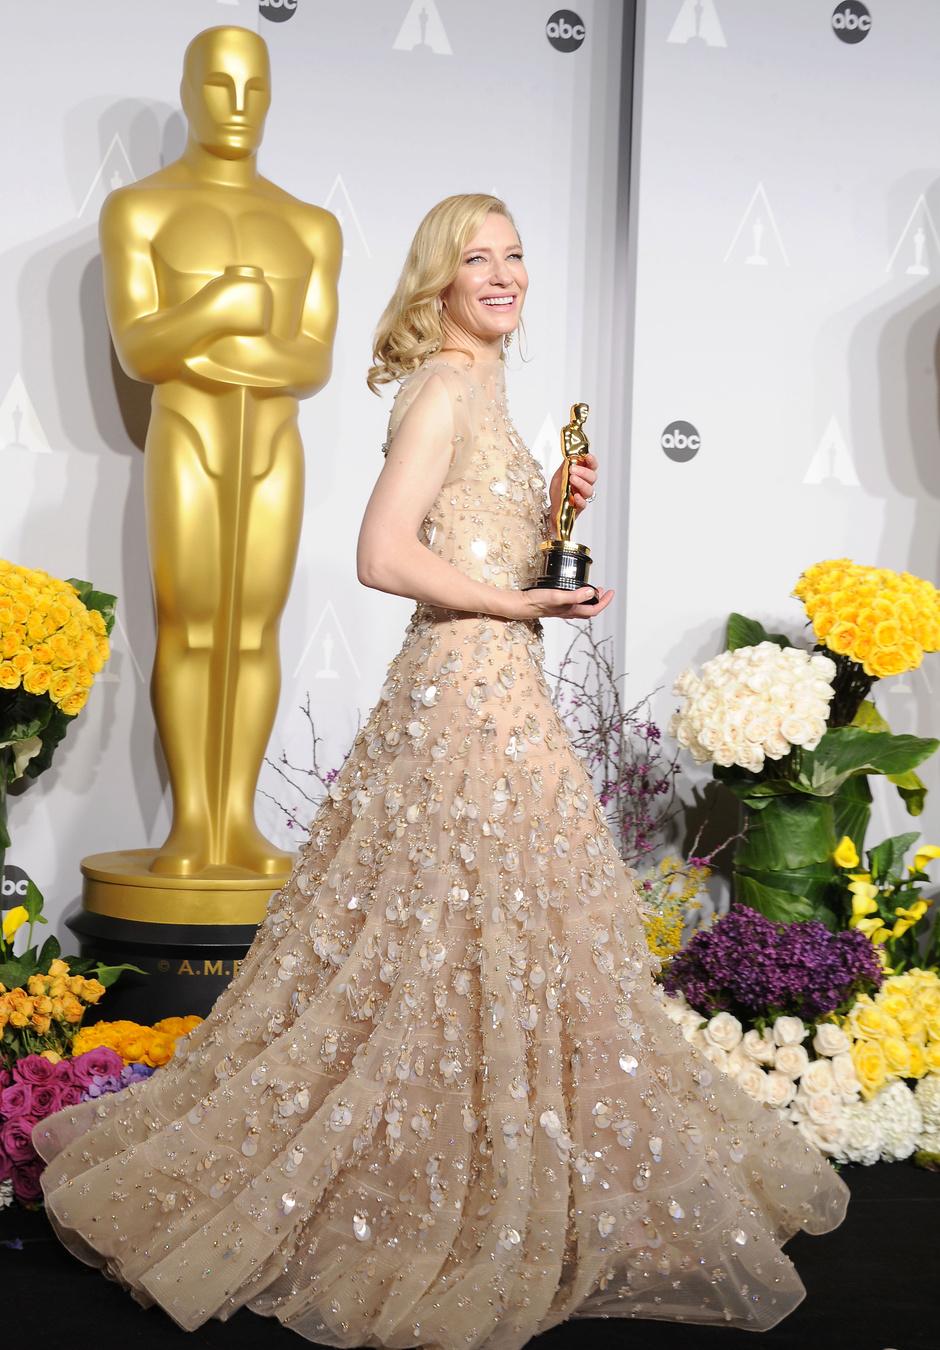 Кейт Бланшетт на церемонии вручения кинонаград «Оскар», 2014 год